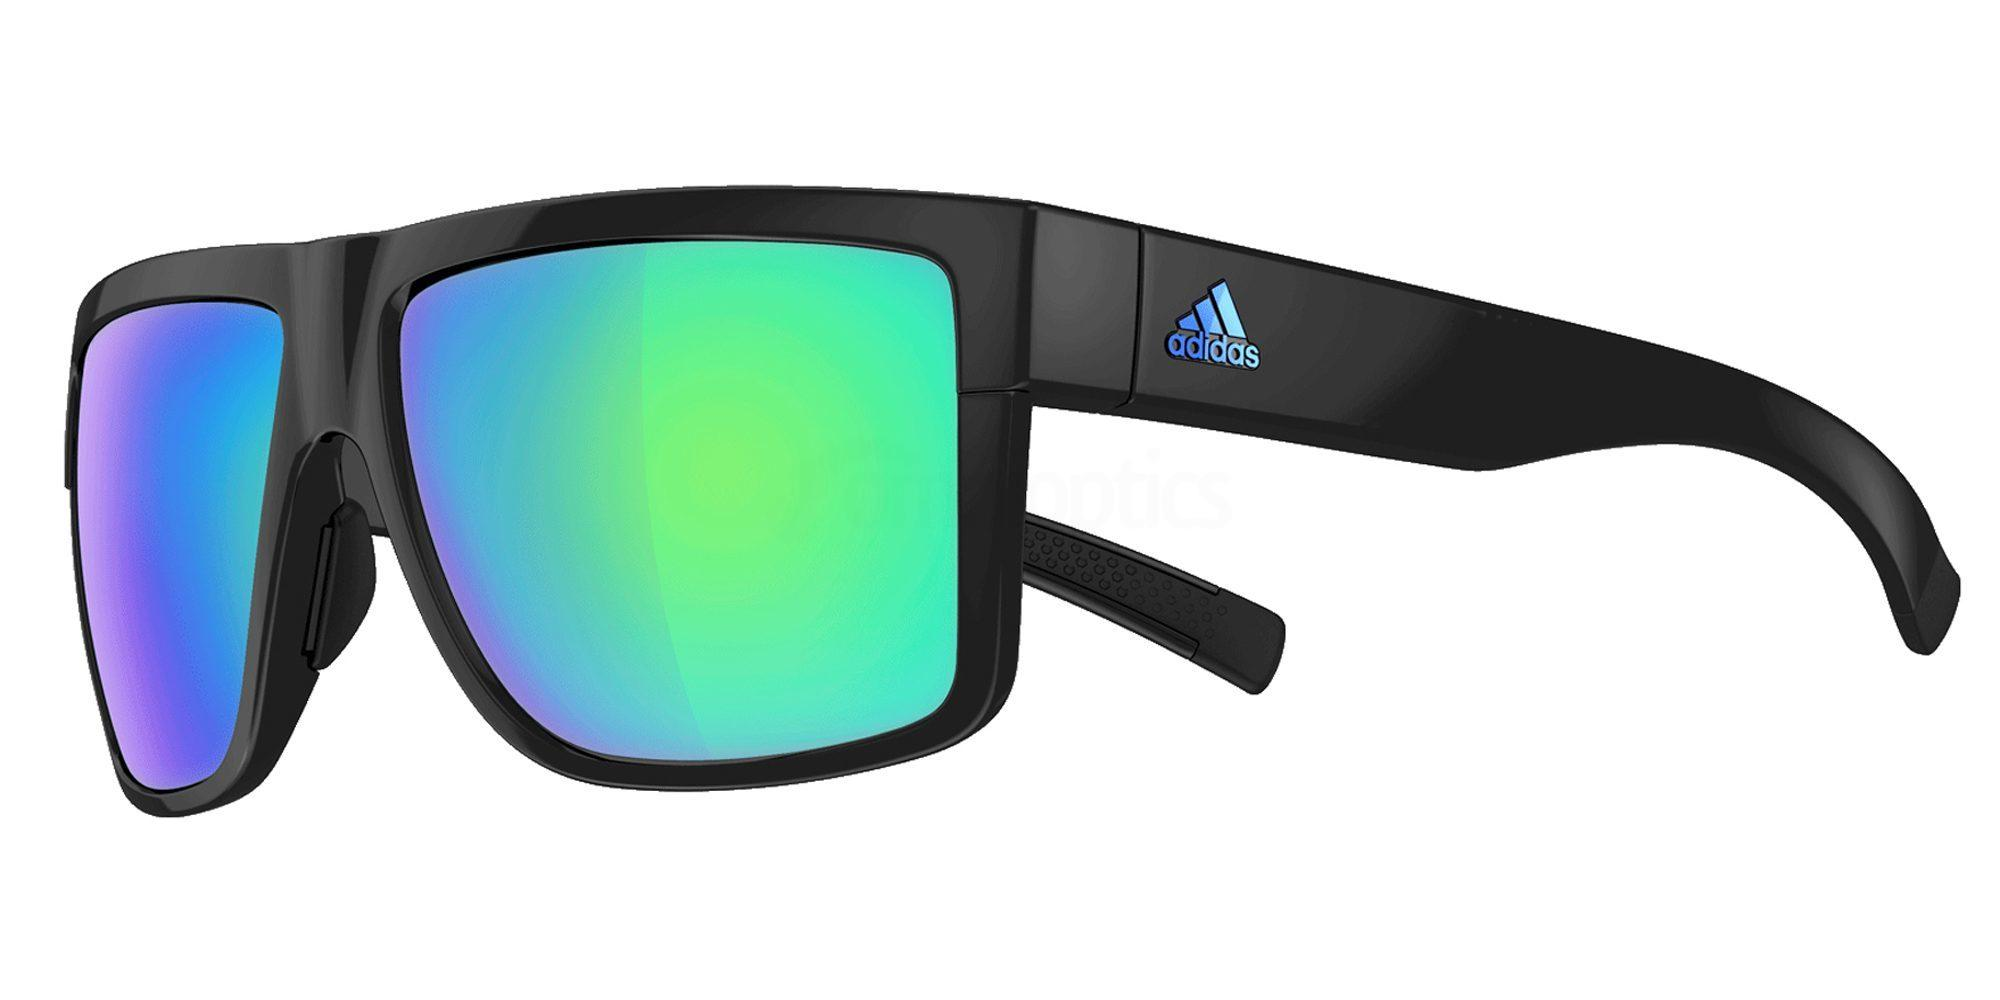 a427 00 6054 a427 3matic Sunglasses, Adidas